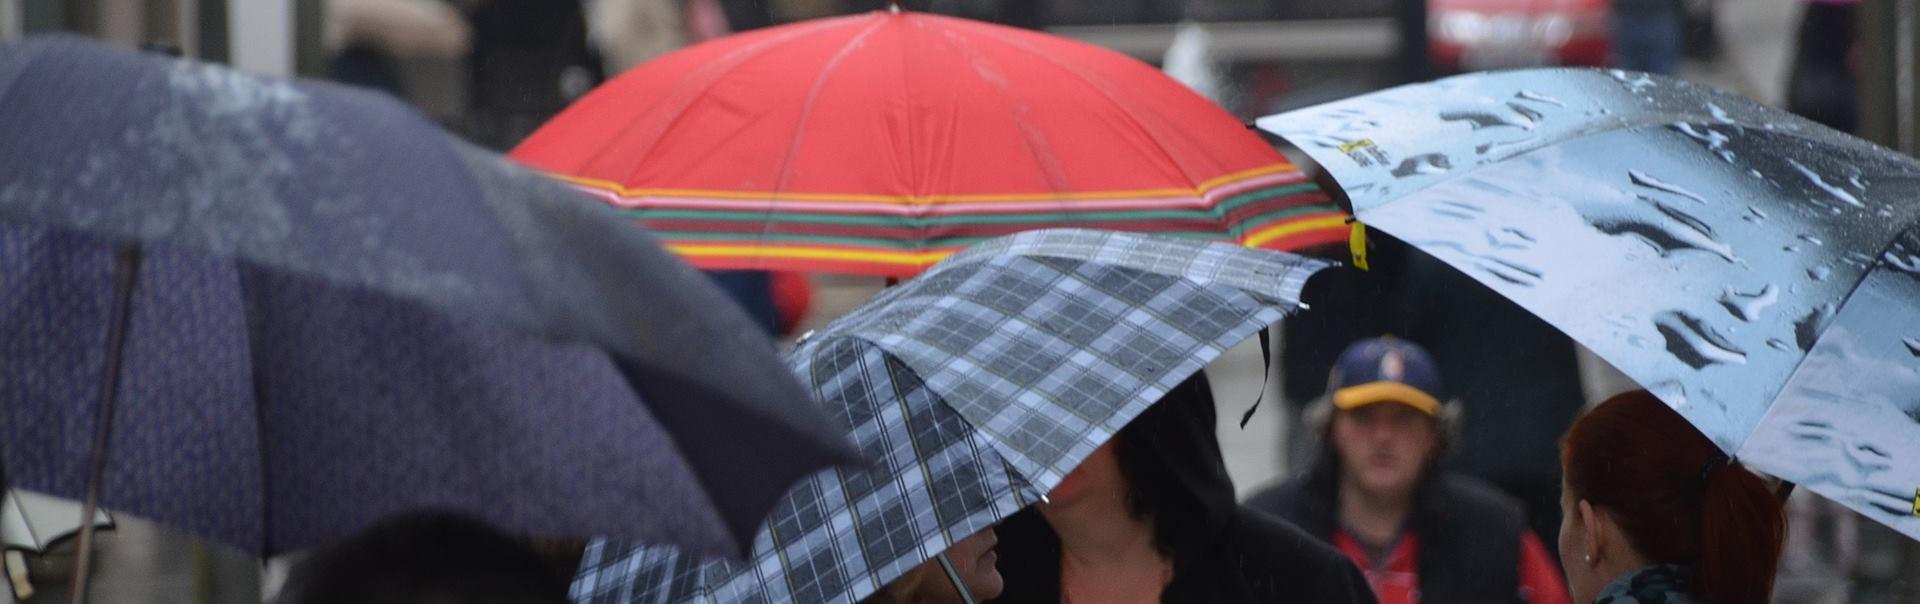 DHMZ: Oblačno s povremenom kišom, češćom na Jadranu